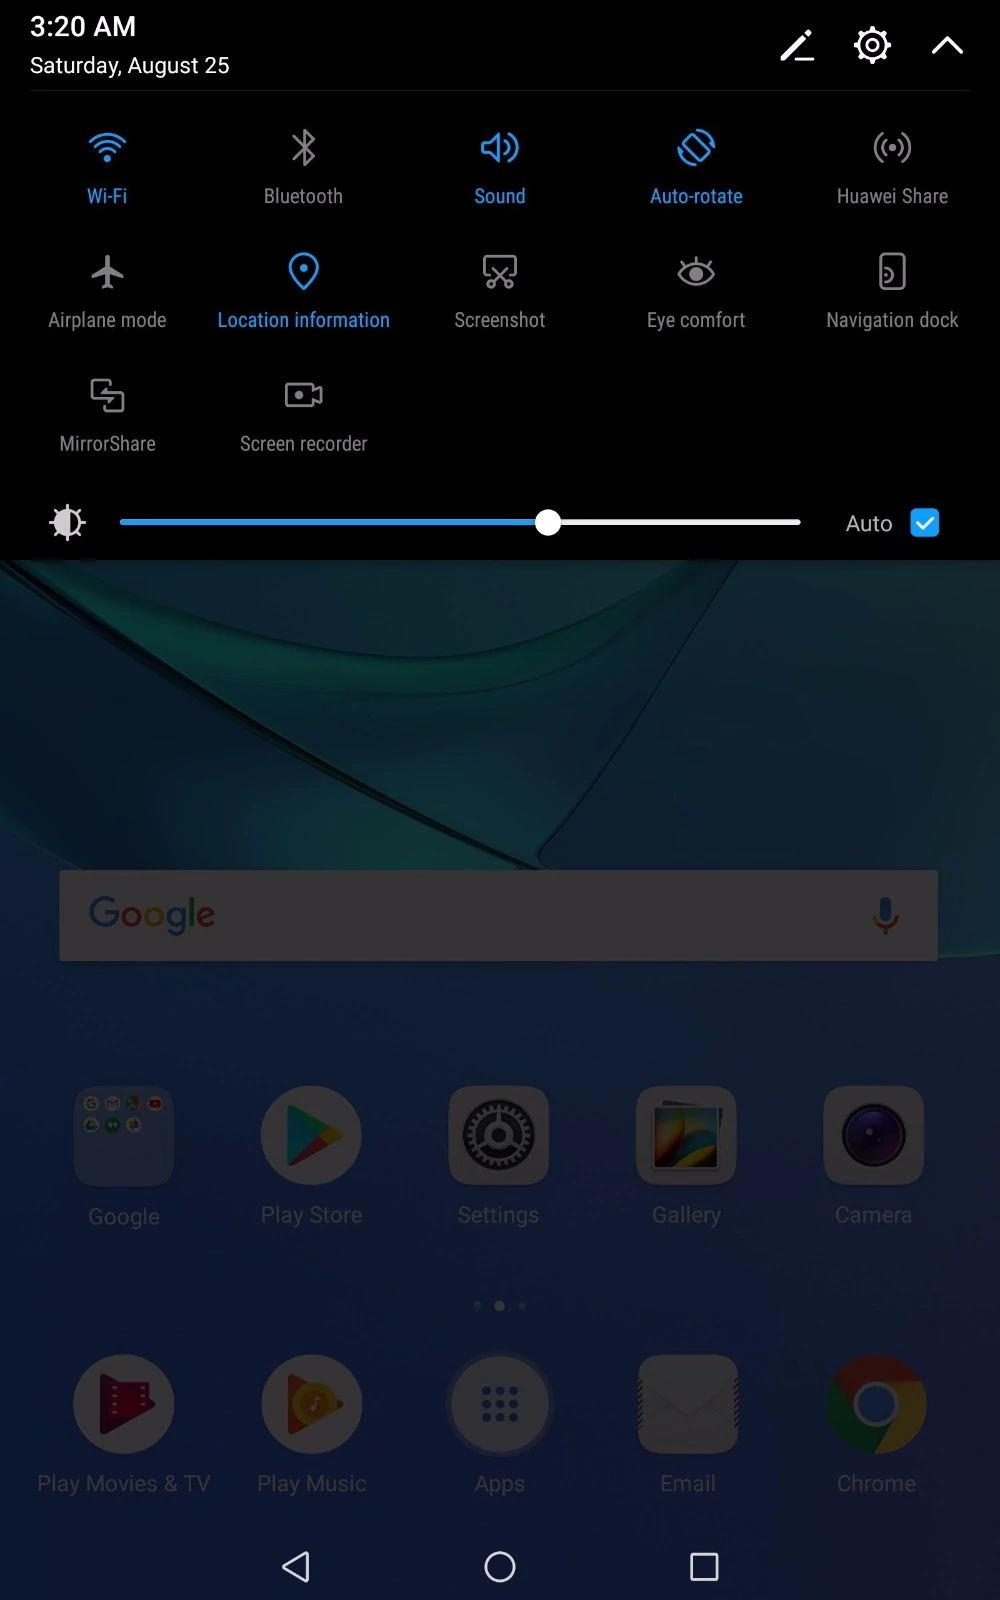 huawei m6 bluetooth wifi 4g 64g tablet 2019